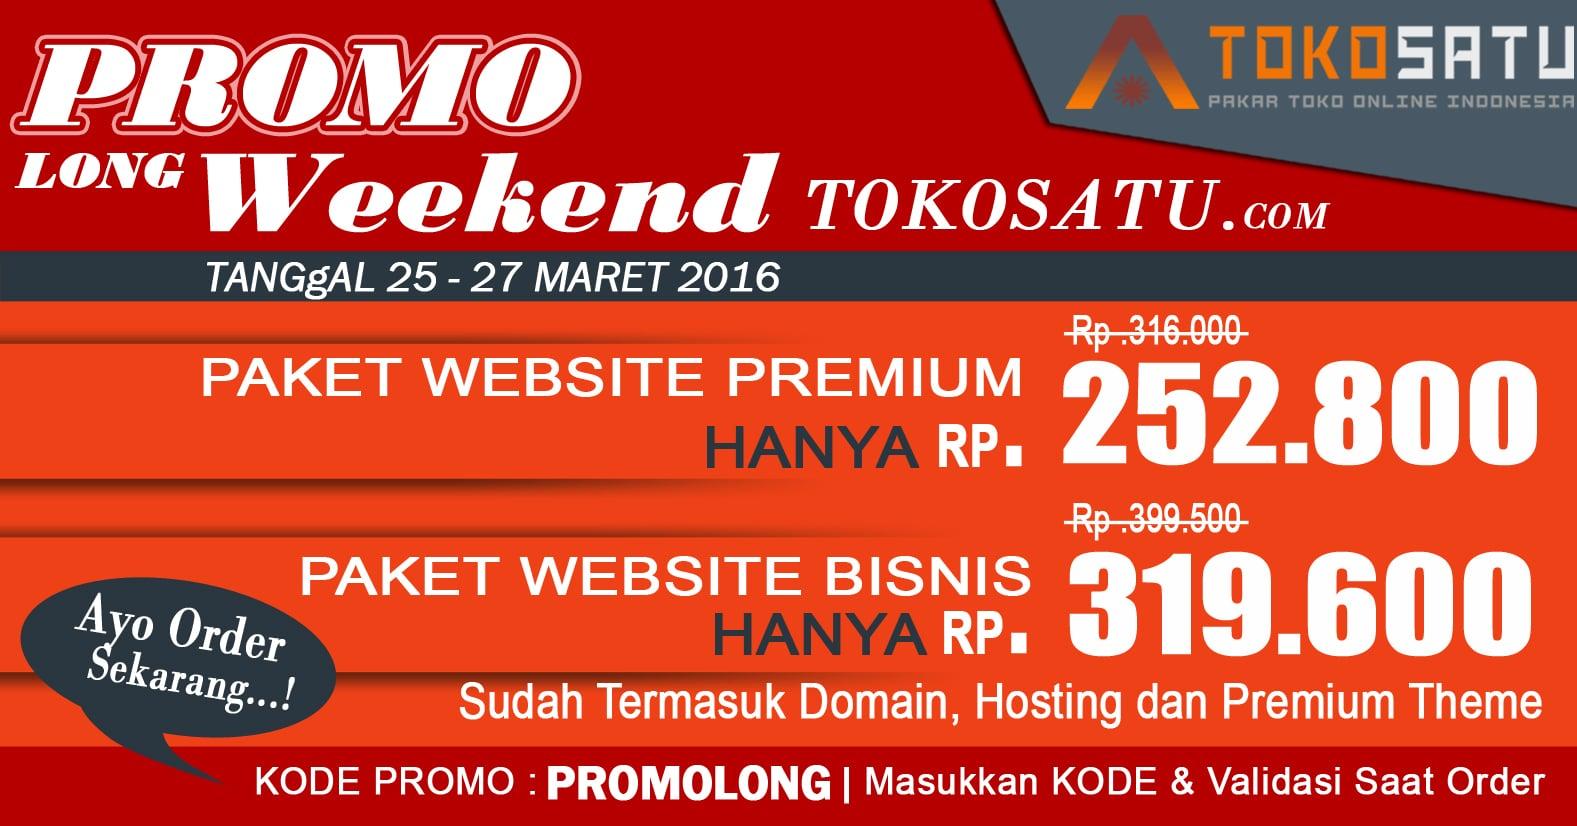 Promo LongWeekend TokoSatu 25-27 Maret 2016